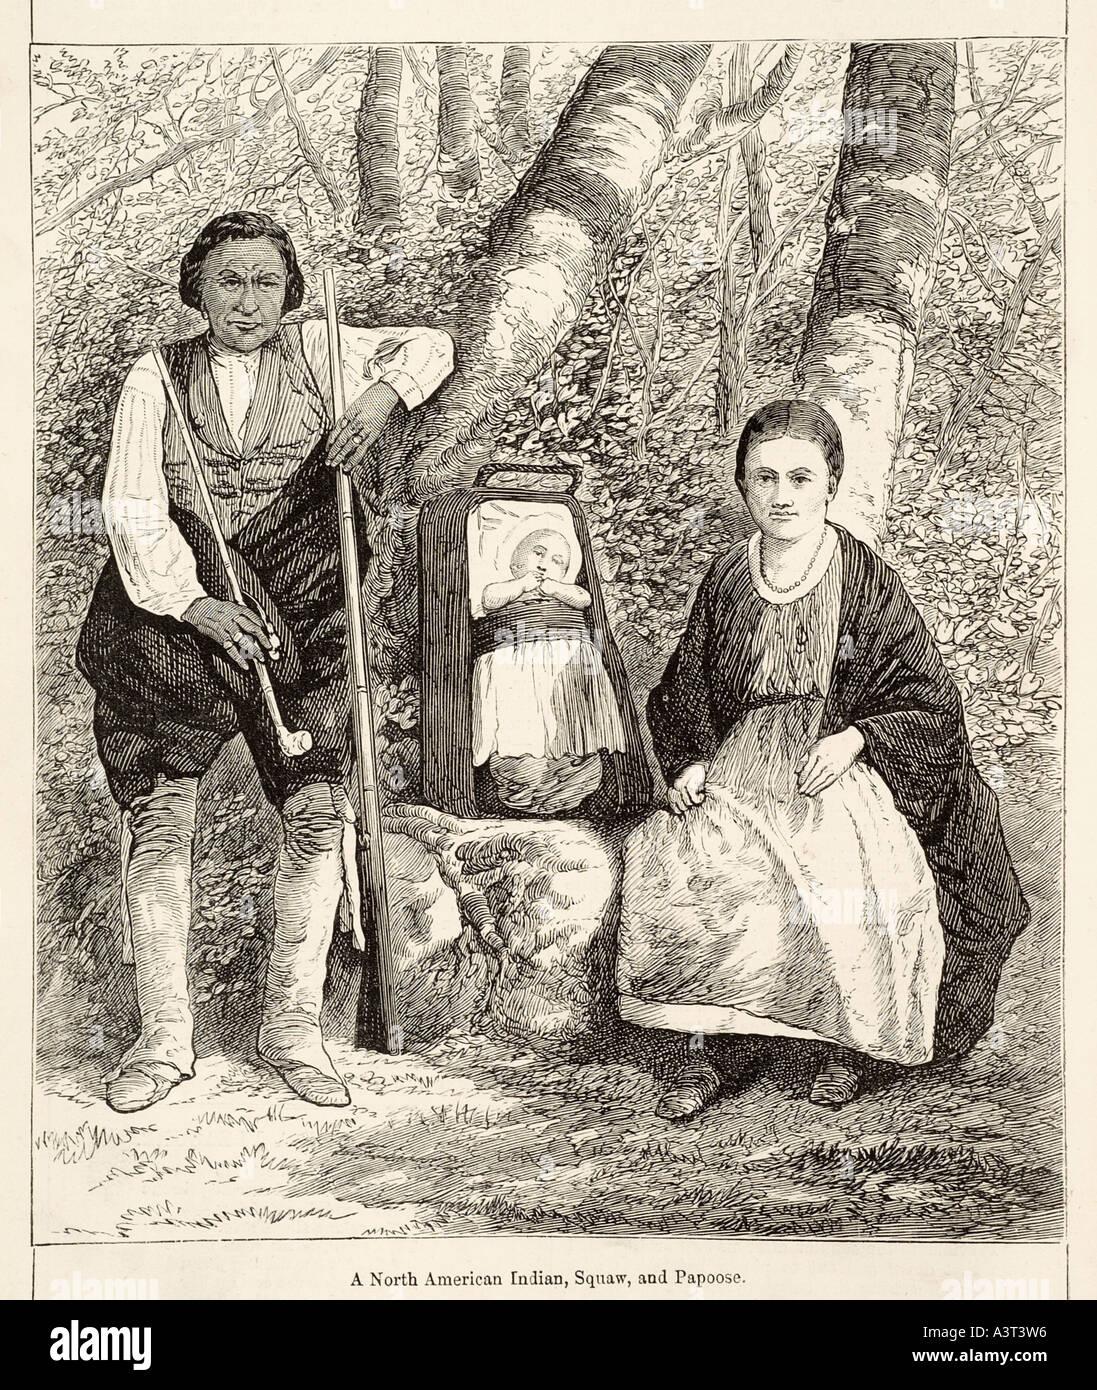 Indian squaw papoose tribu americana nativa de América hombre mujer bebé  plantean bosque madera noble salvaje 4bcee522d178